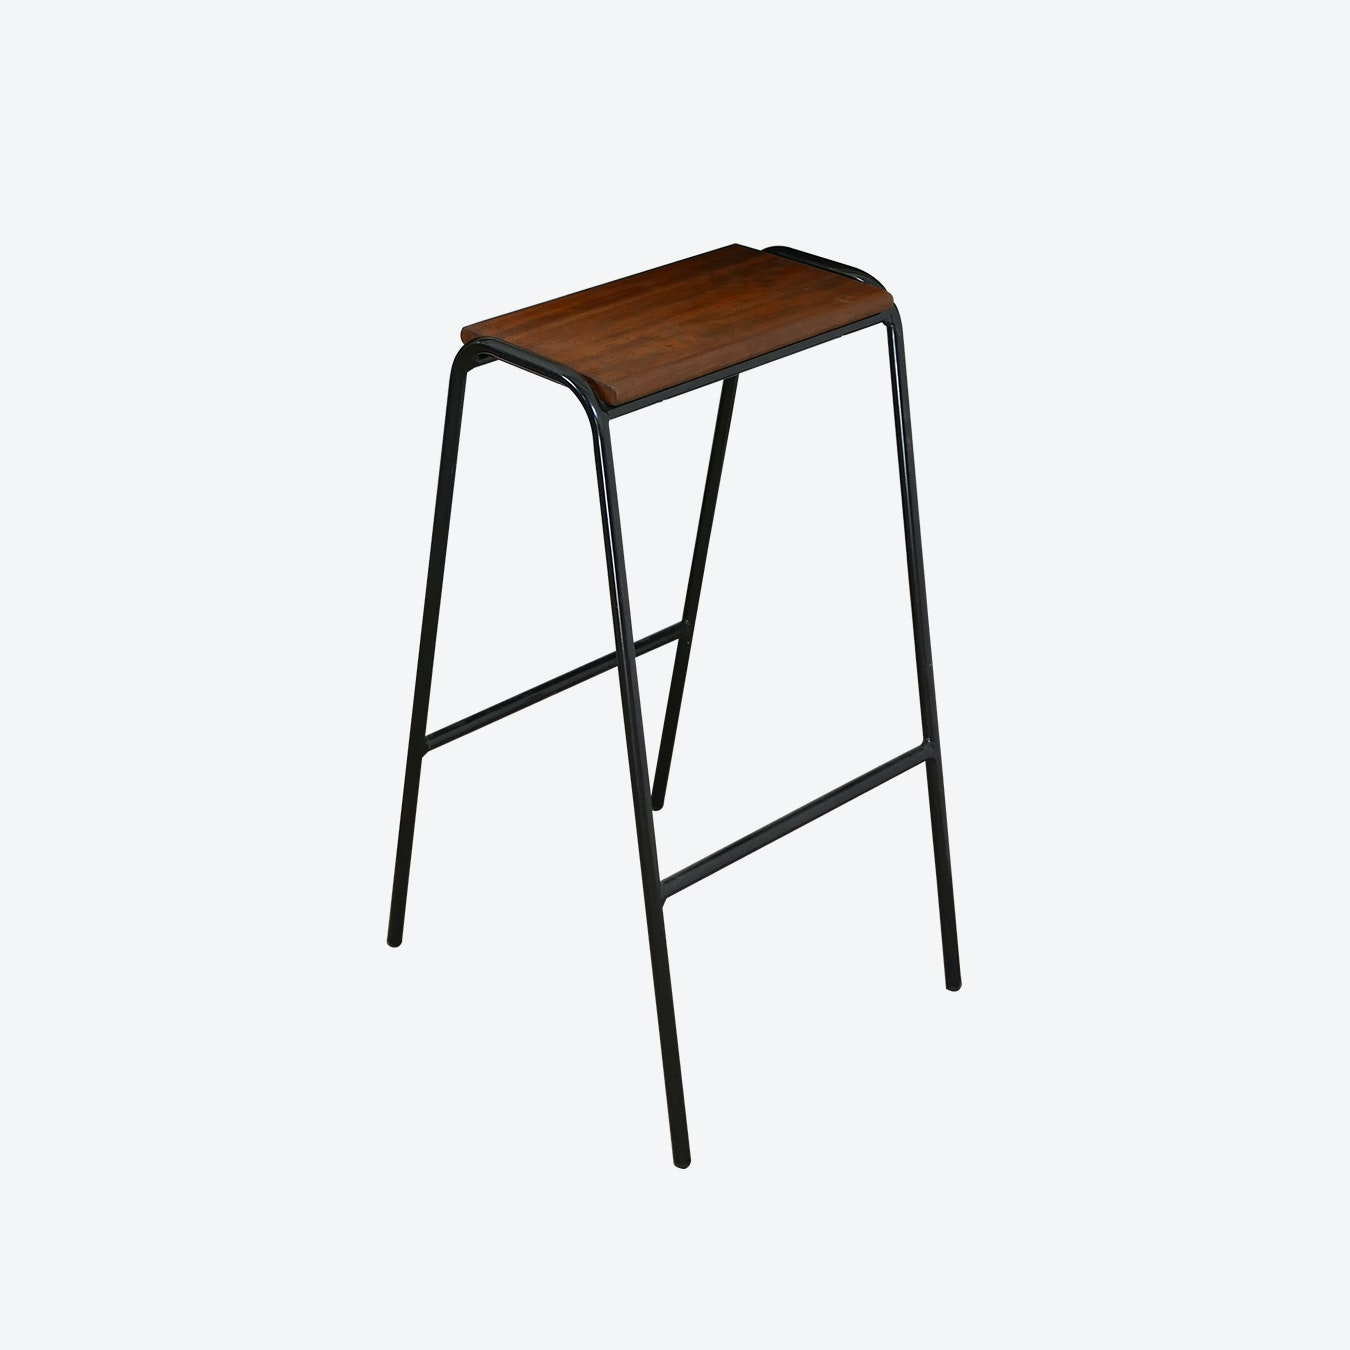 Cool Pill Stool In Black W Iroko Wood Seat Dailytribune Chair Design For Home Dailytribuneorg